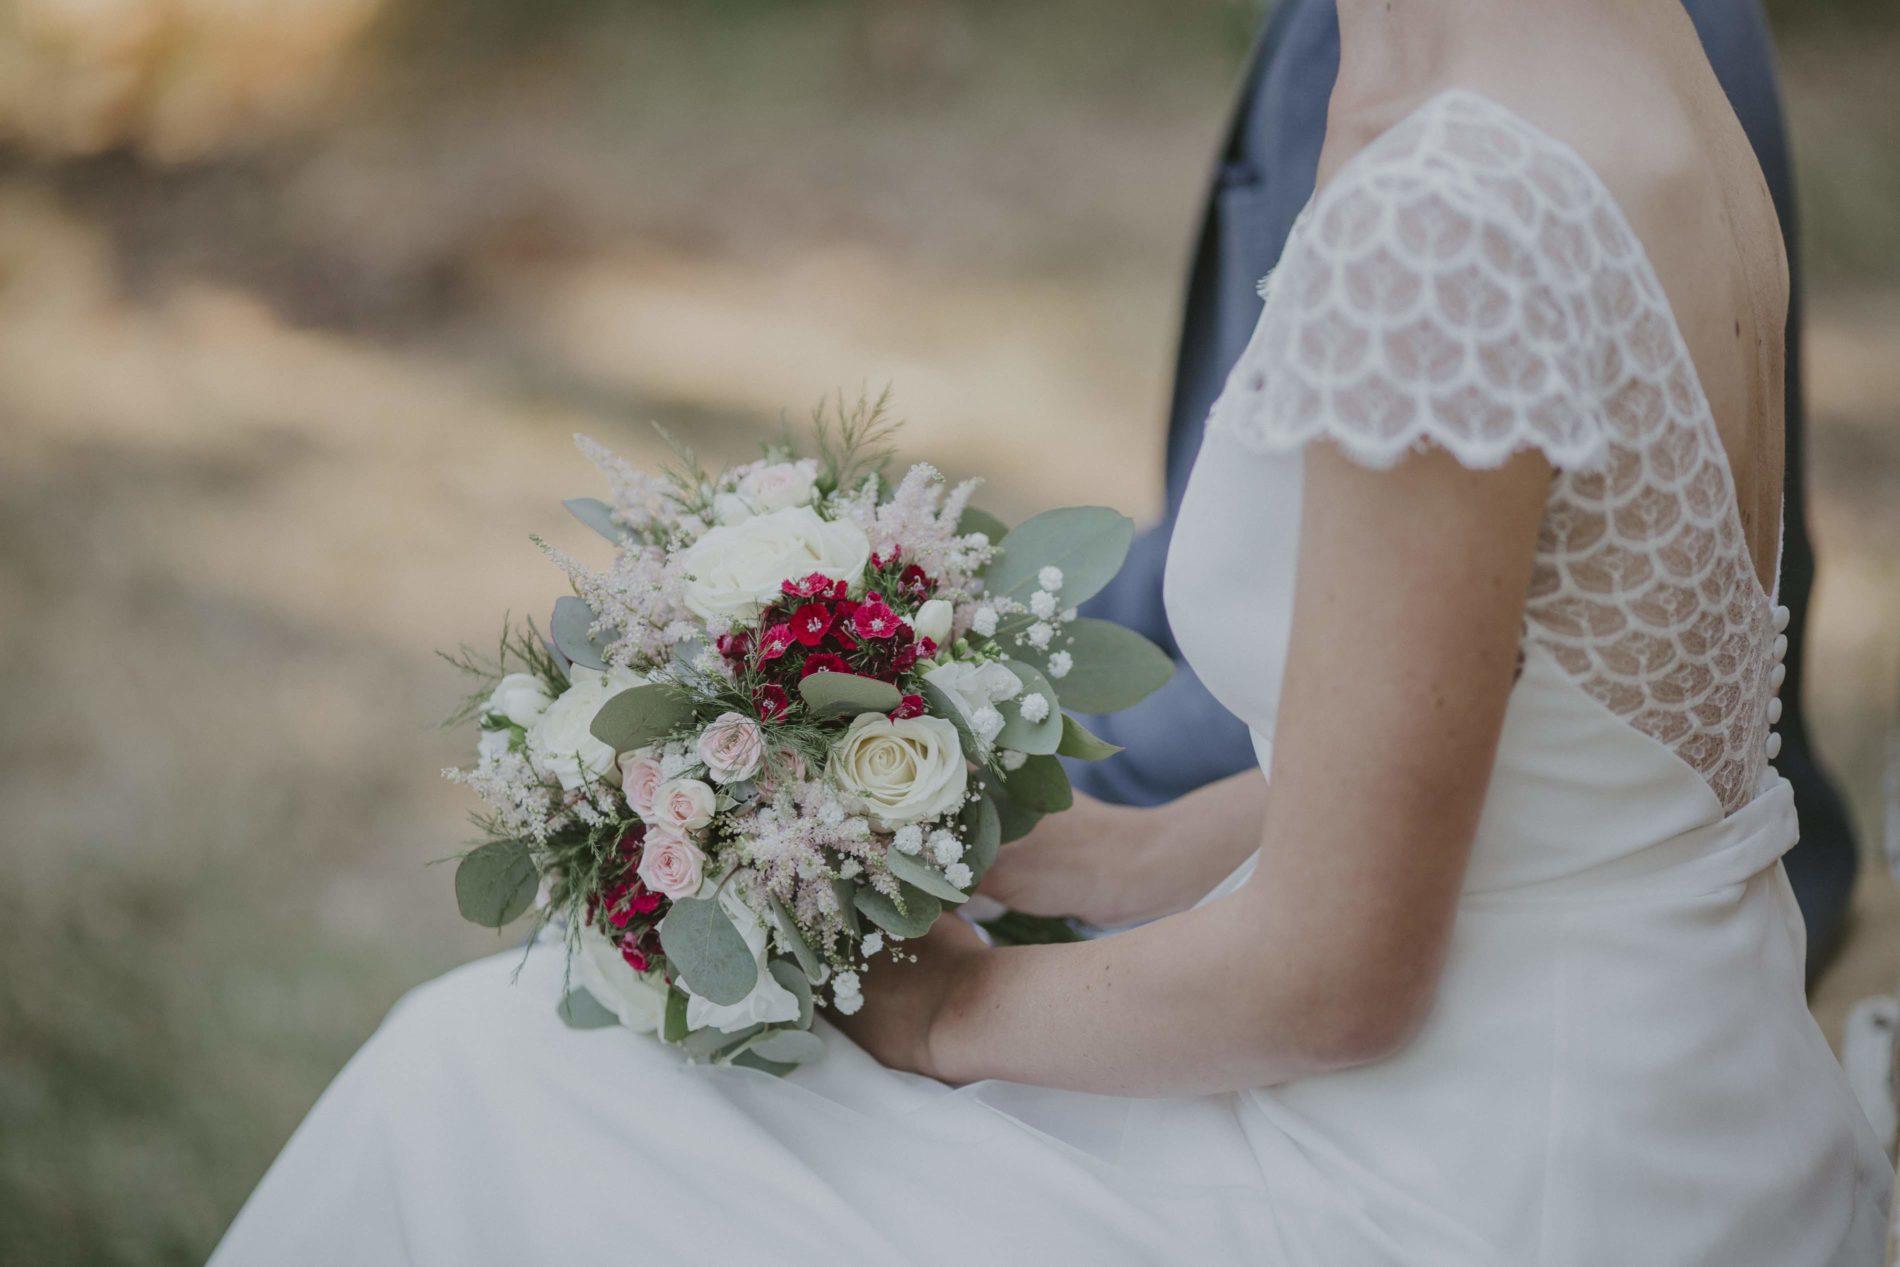 03-CelineSereivuth-172-obonheurdesdames-decoration-mariage-location-Jordane-Chaillou